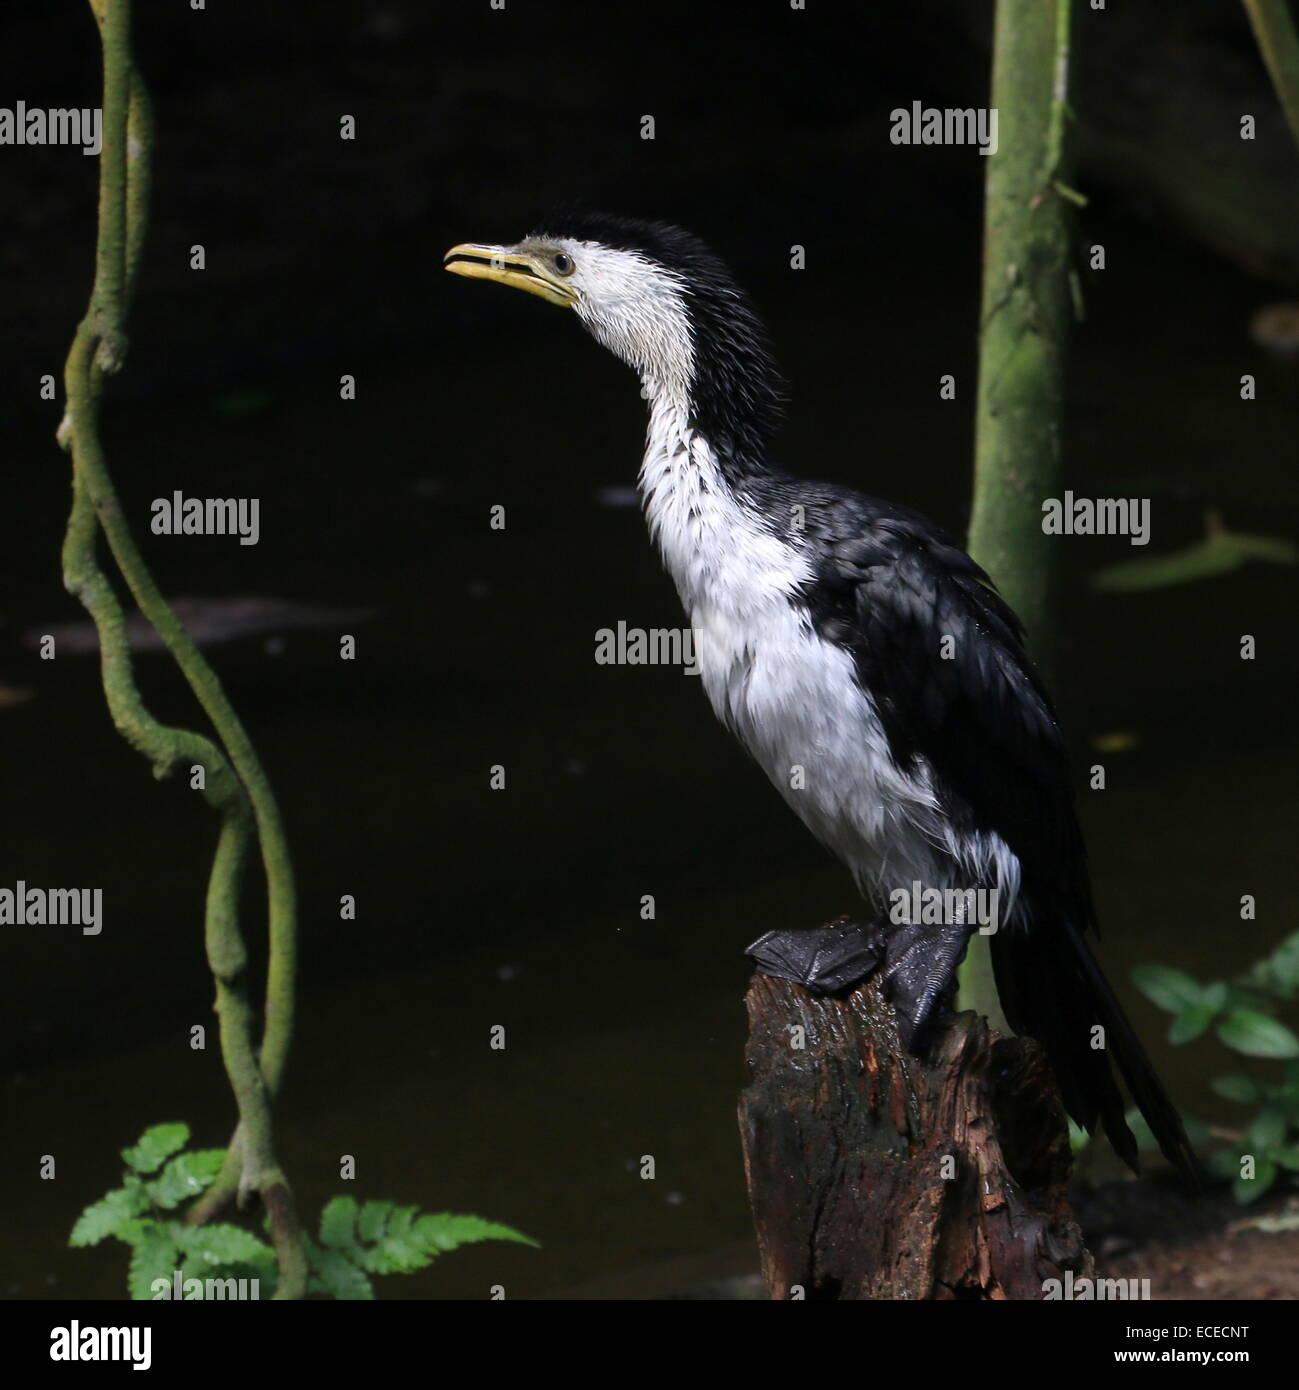 Australian Little pied cormorant (Phalacrocorax melanoleucos, Microcarbo melanoleucos) - Stock Image